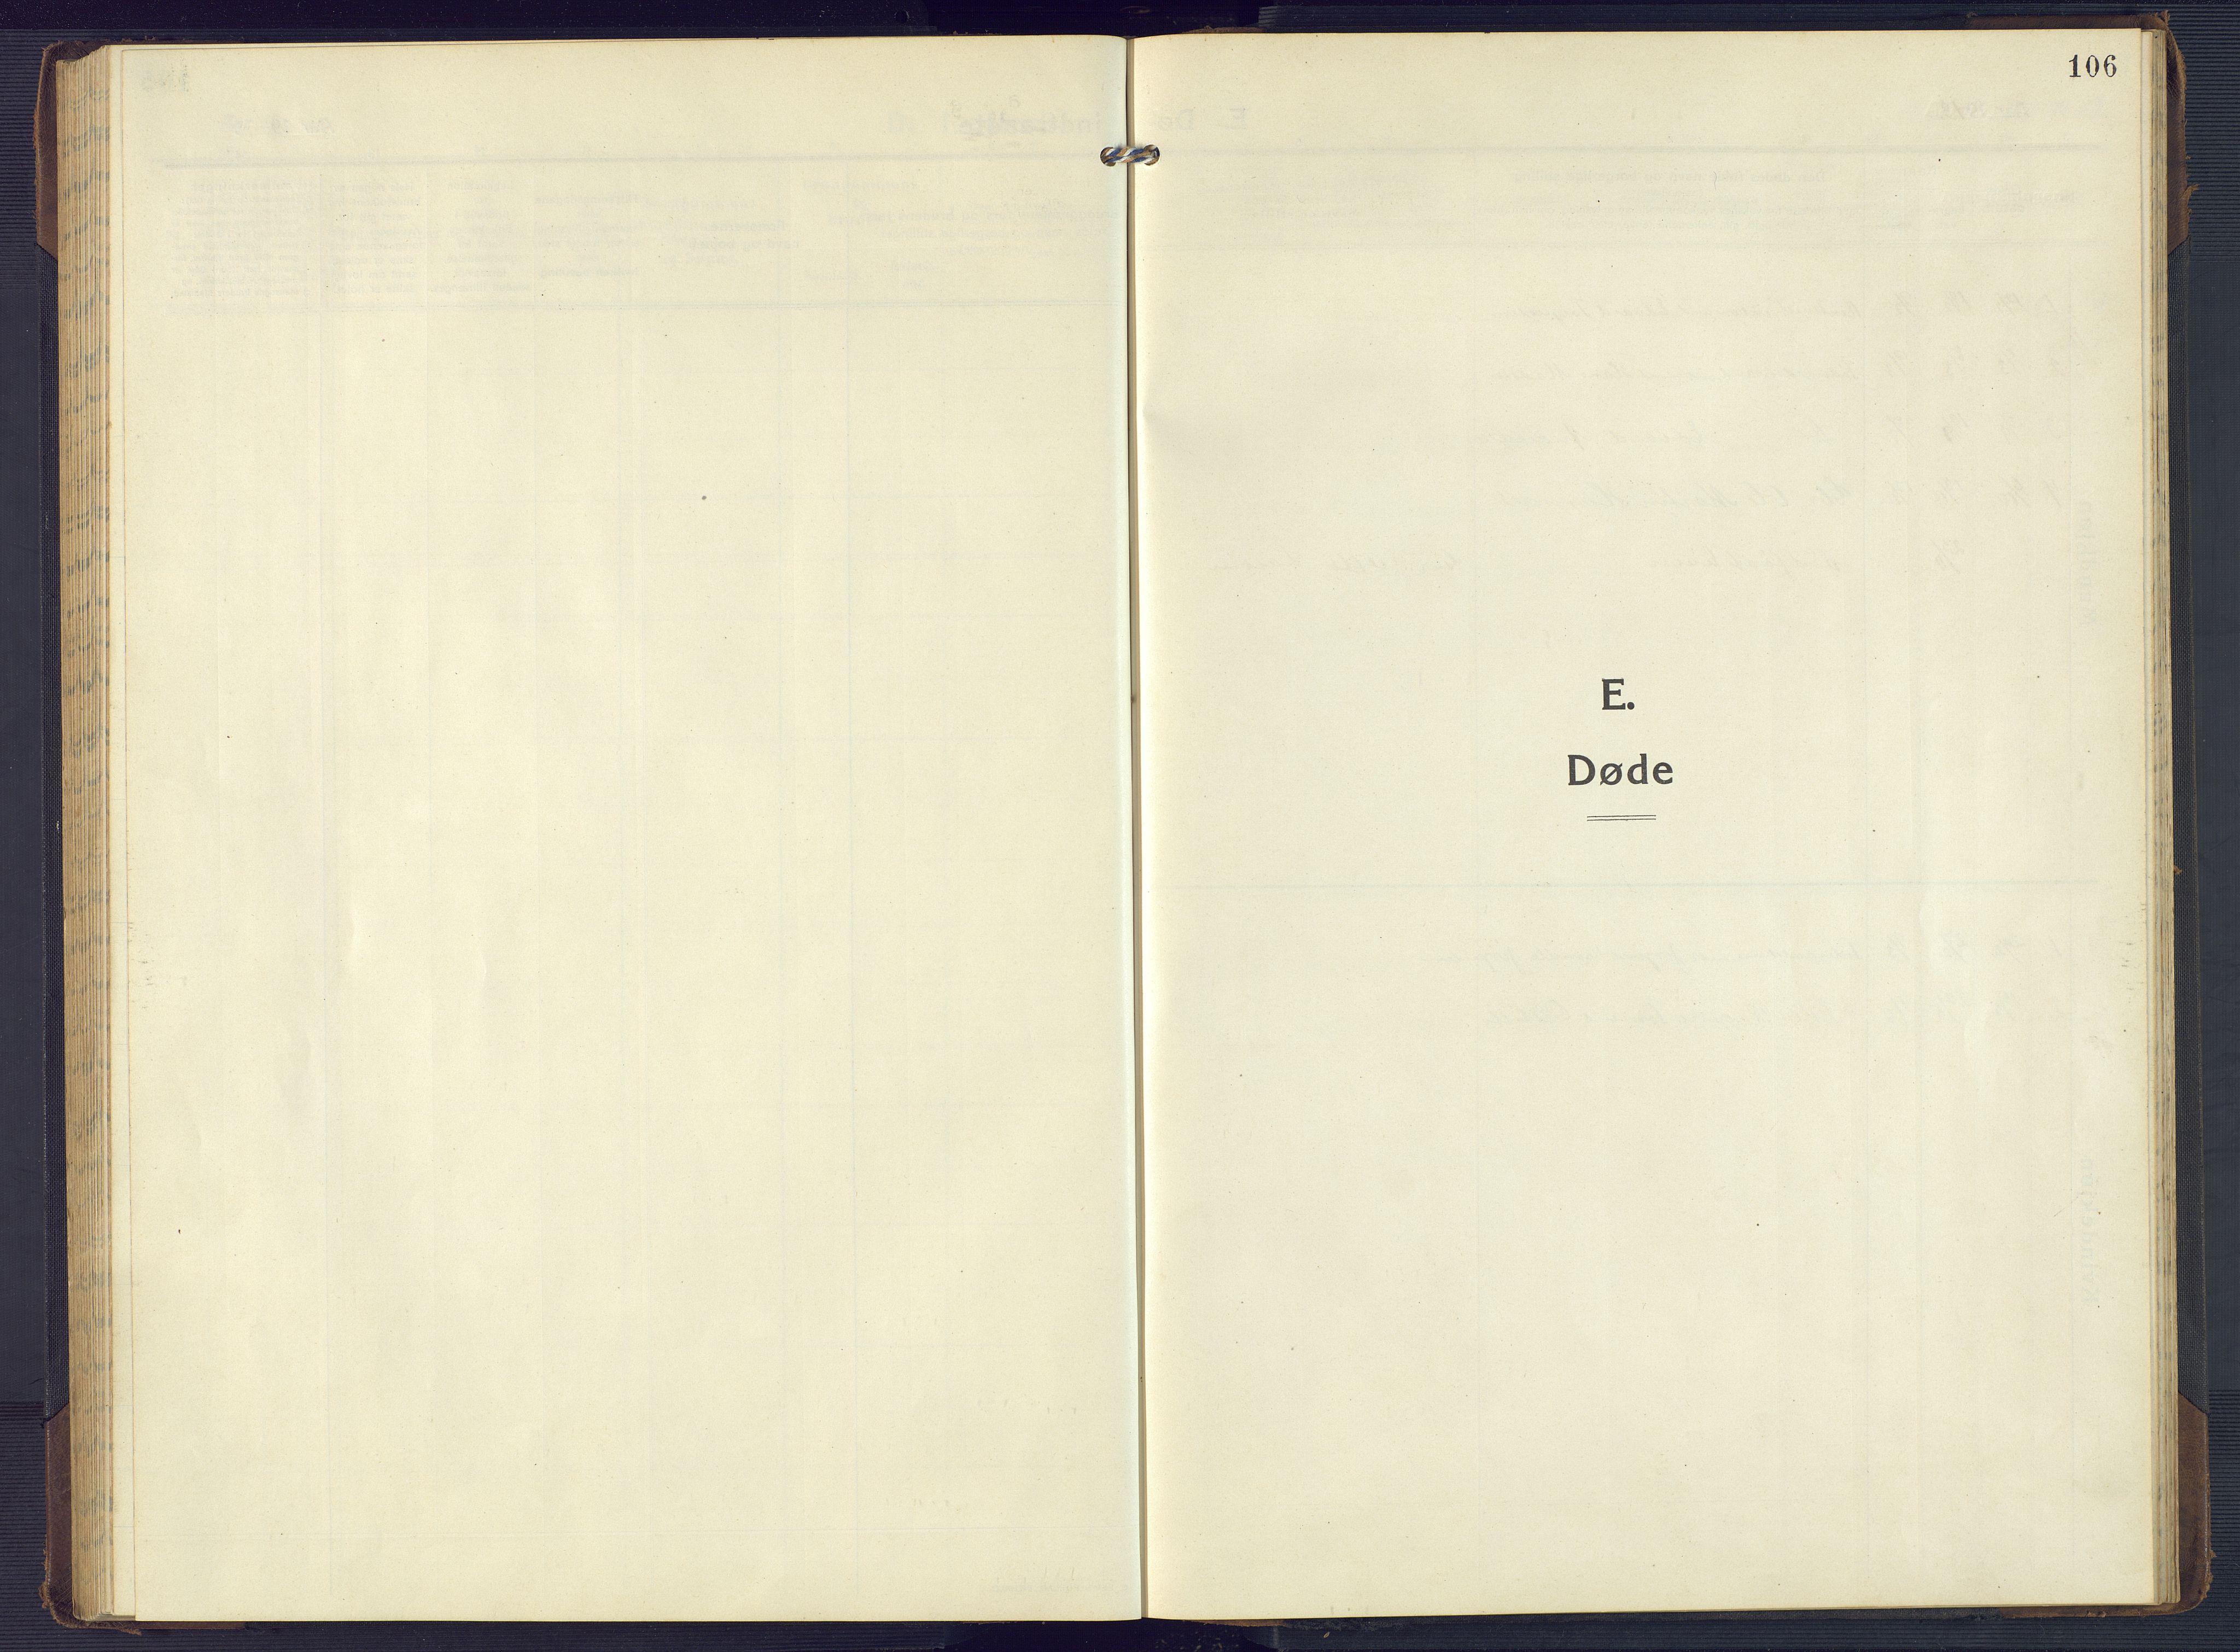 SAK, Mandal sokneprestkontor, F/Fb/Fbb/L0005: Klokkerbok nr. B 5, 1913-1957, s. 106